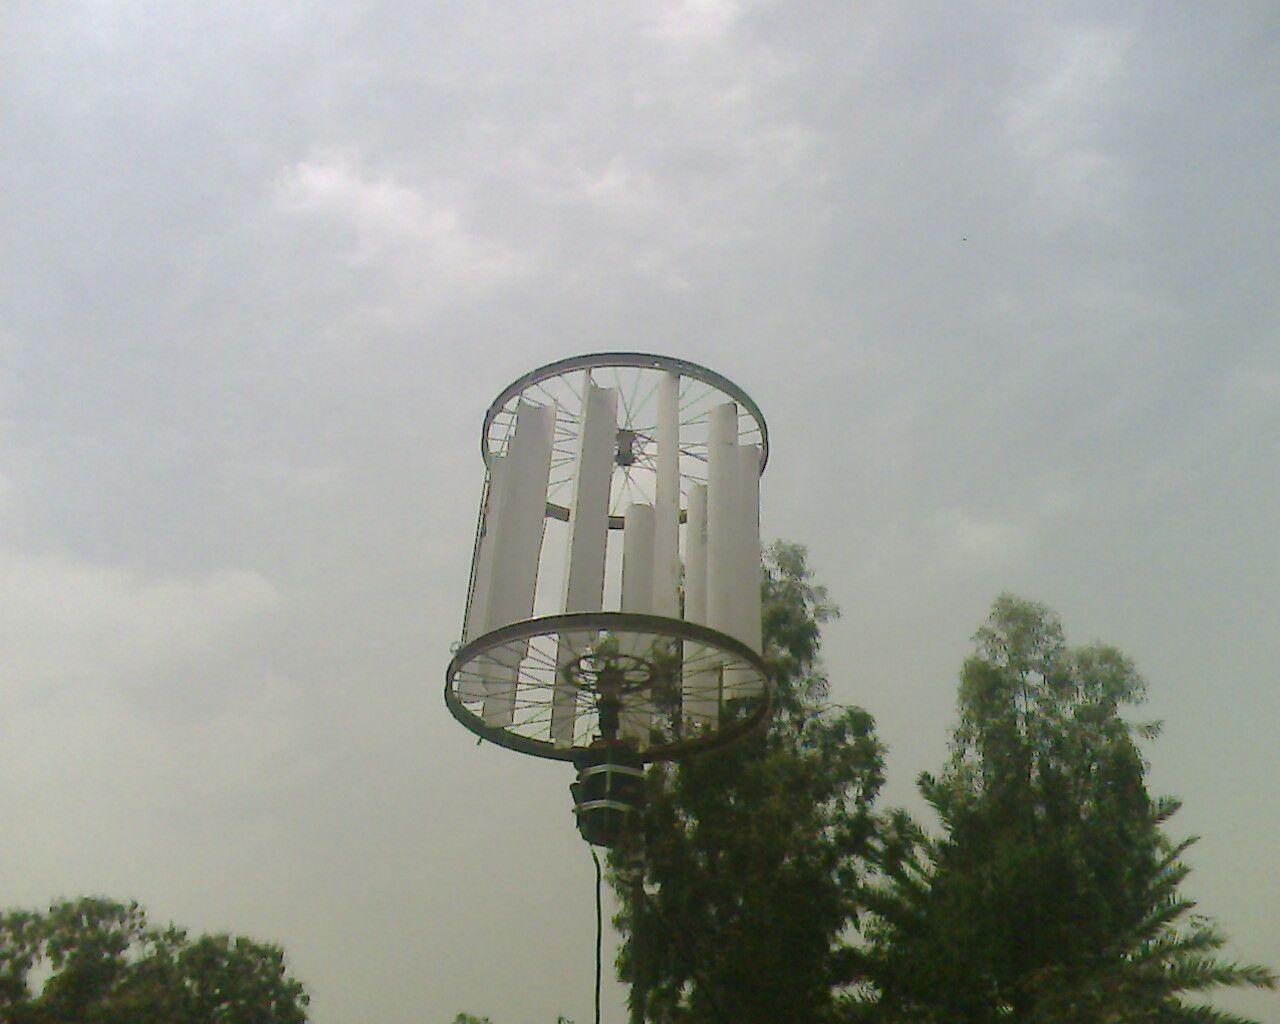 Diy wind turbine vertical wind turbine wind turbine